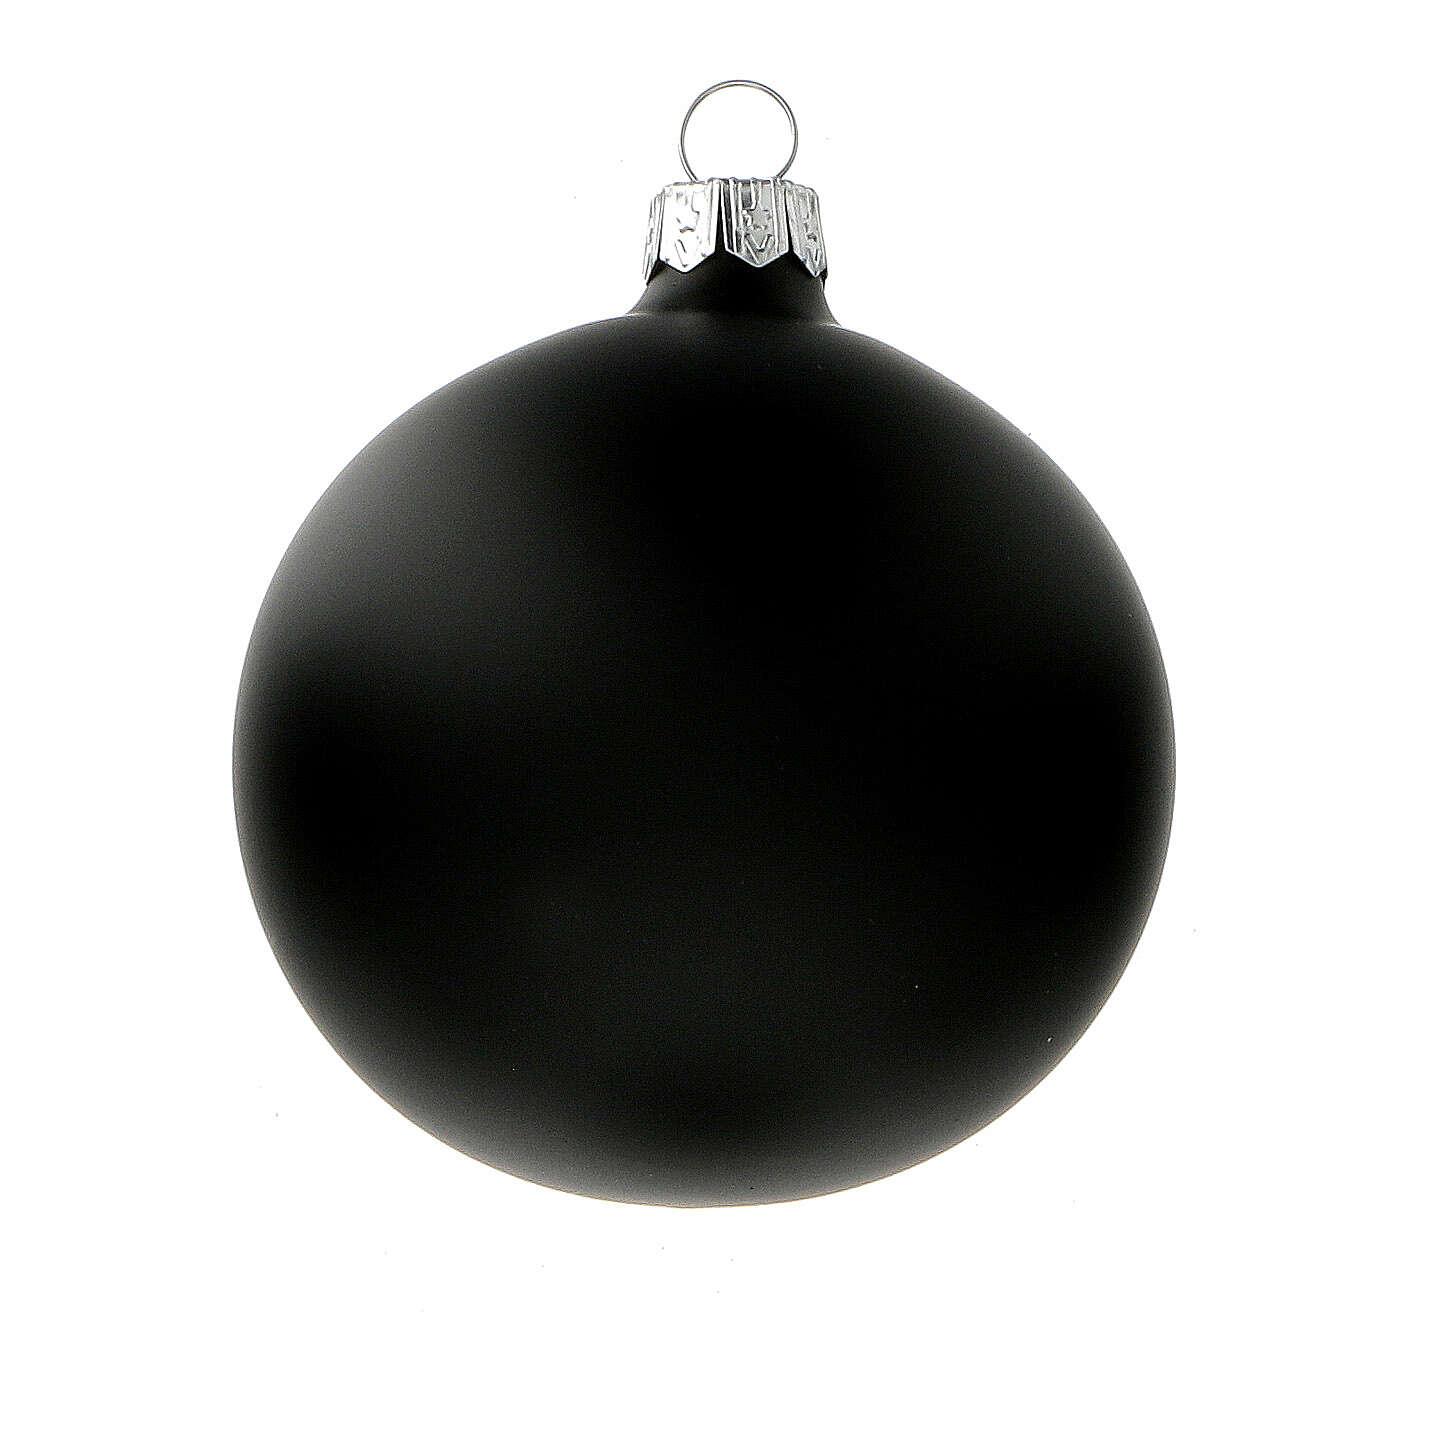 Palline albero Natale nero opaco vetro soffiato 80 mm 6 pz 4